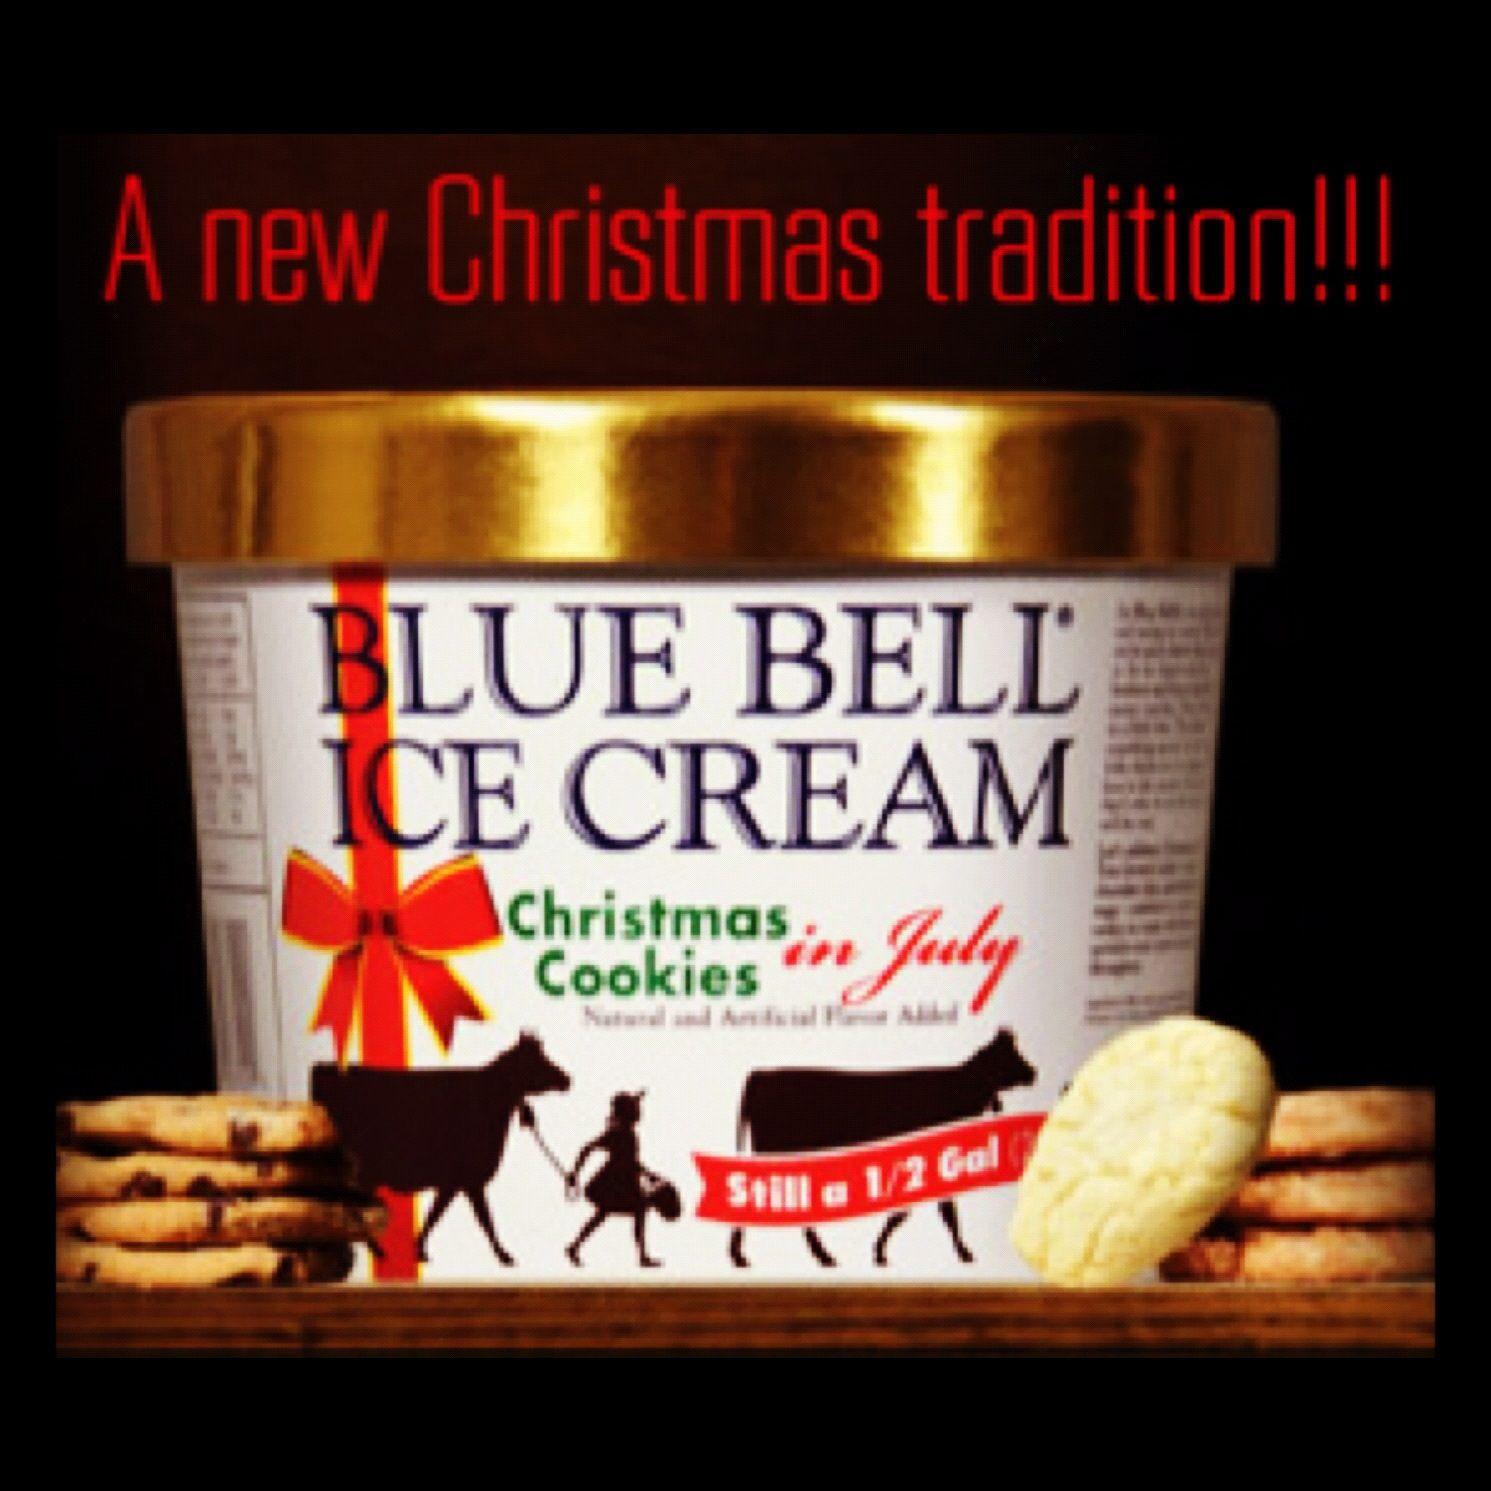 Christmas Cookies Ice Cream  Bluebell Christmas Cookie Ice Cream